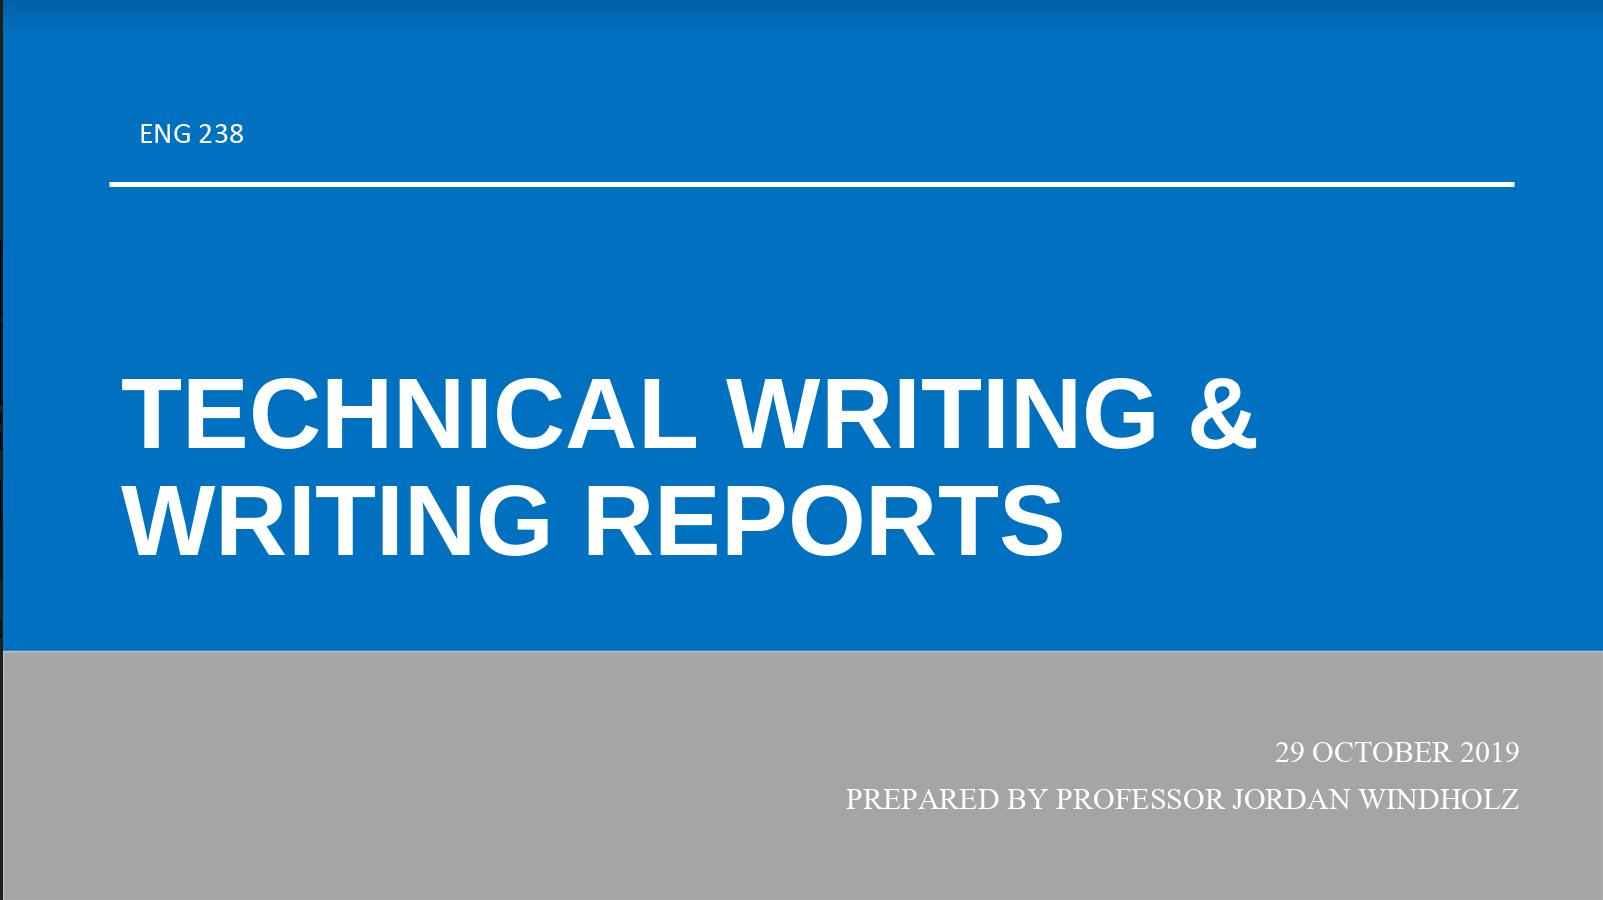 writingreports.PNG